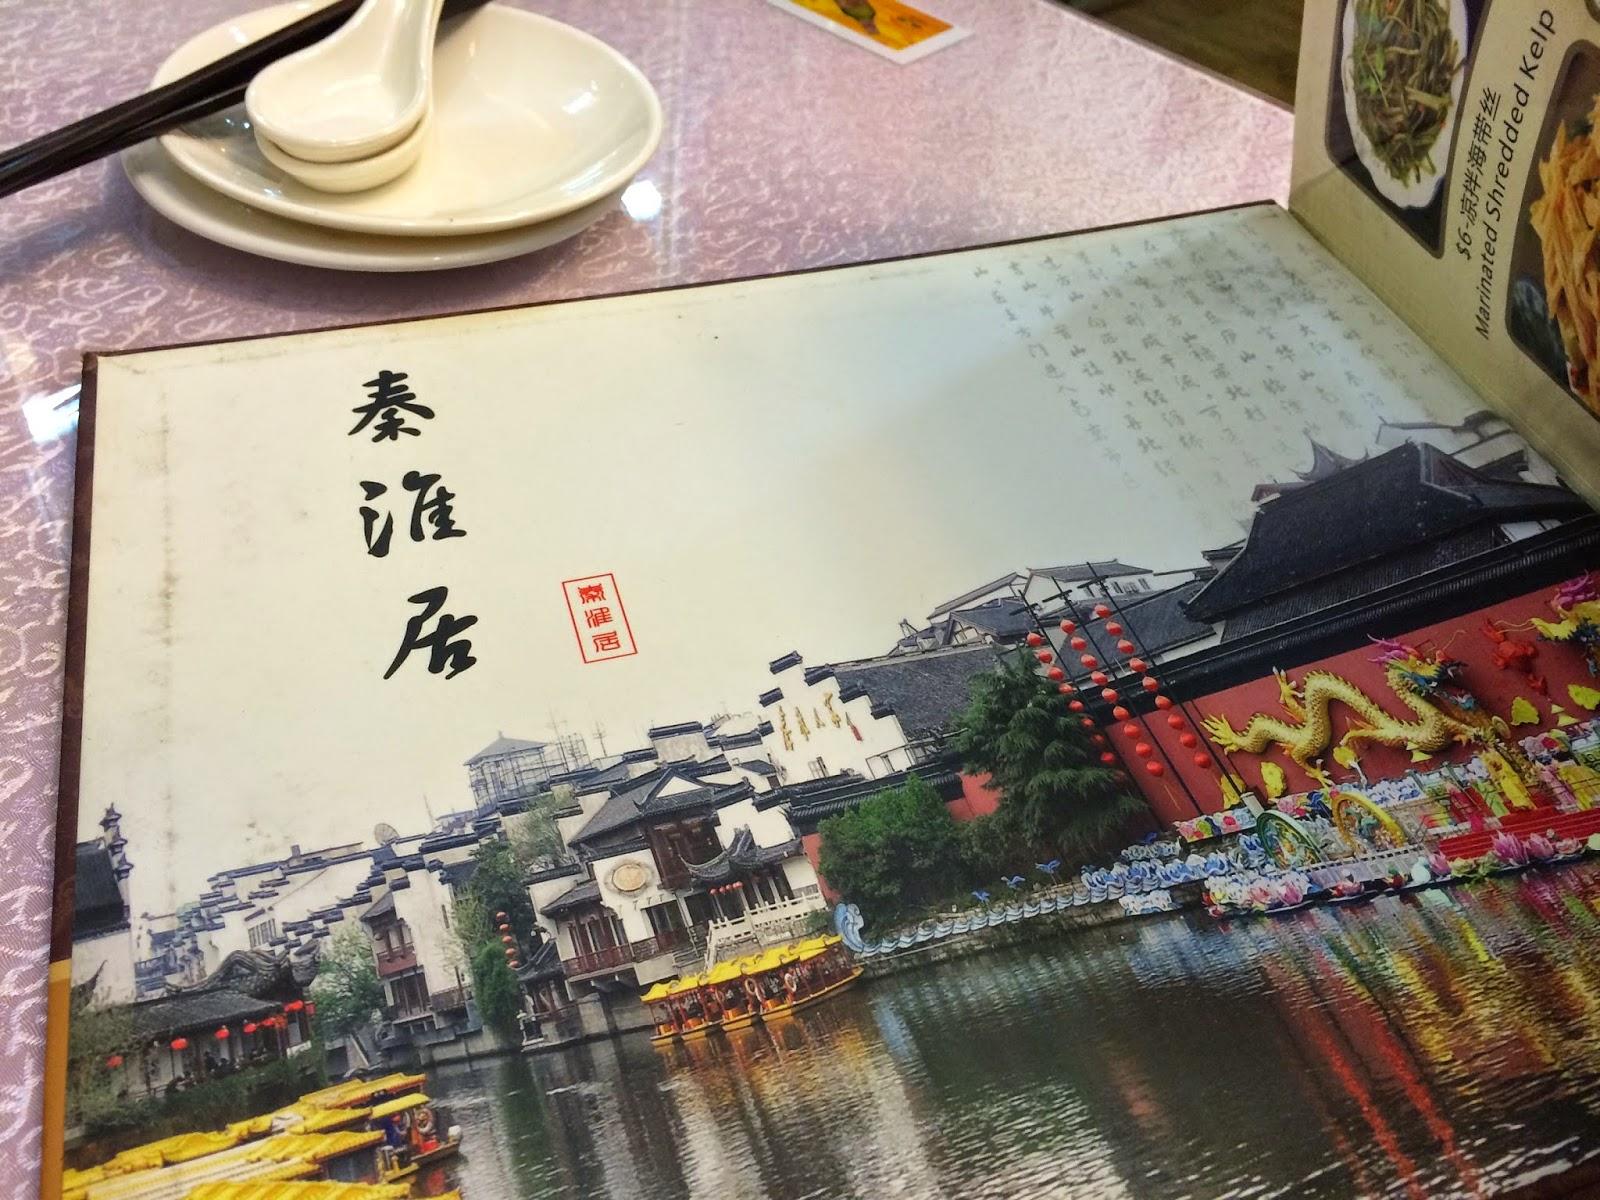 Nanjing food!